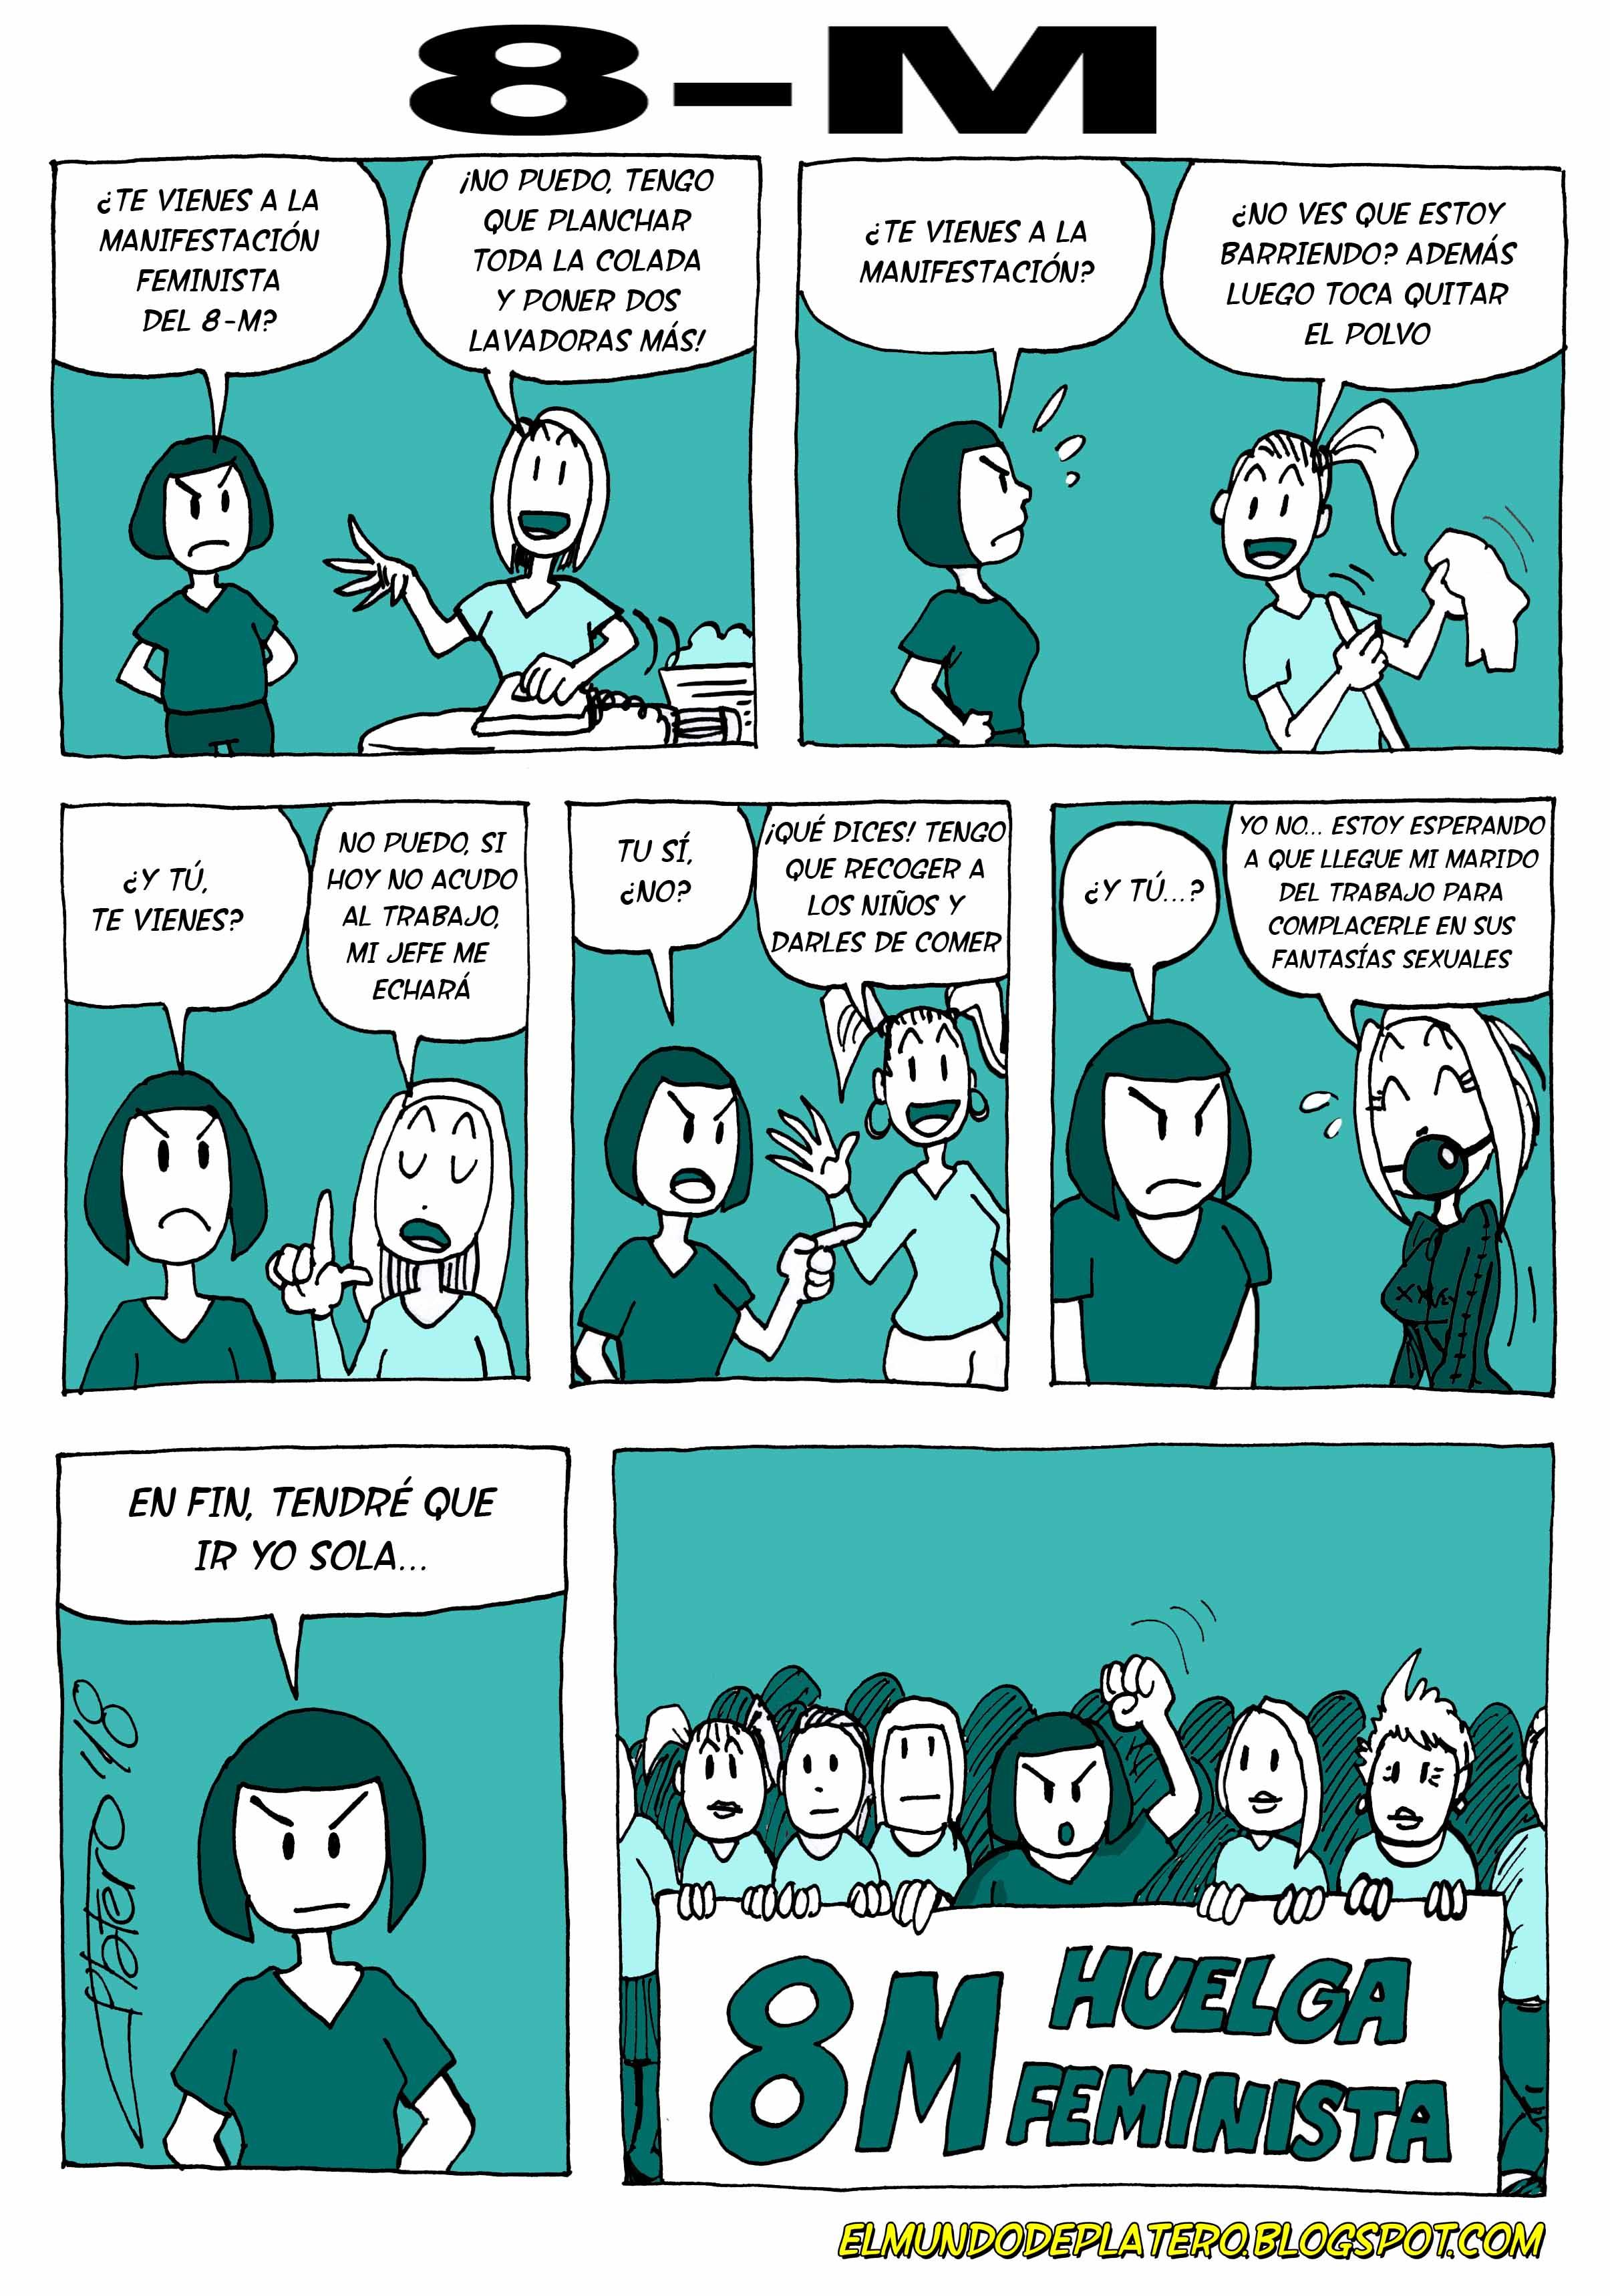 huelga_feminista_8_m_jose_luis_platero